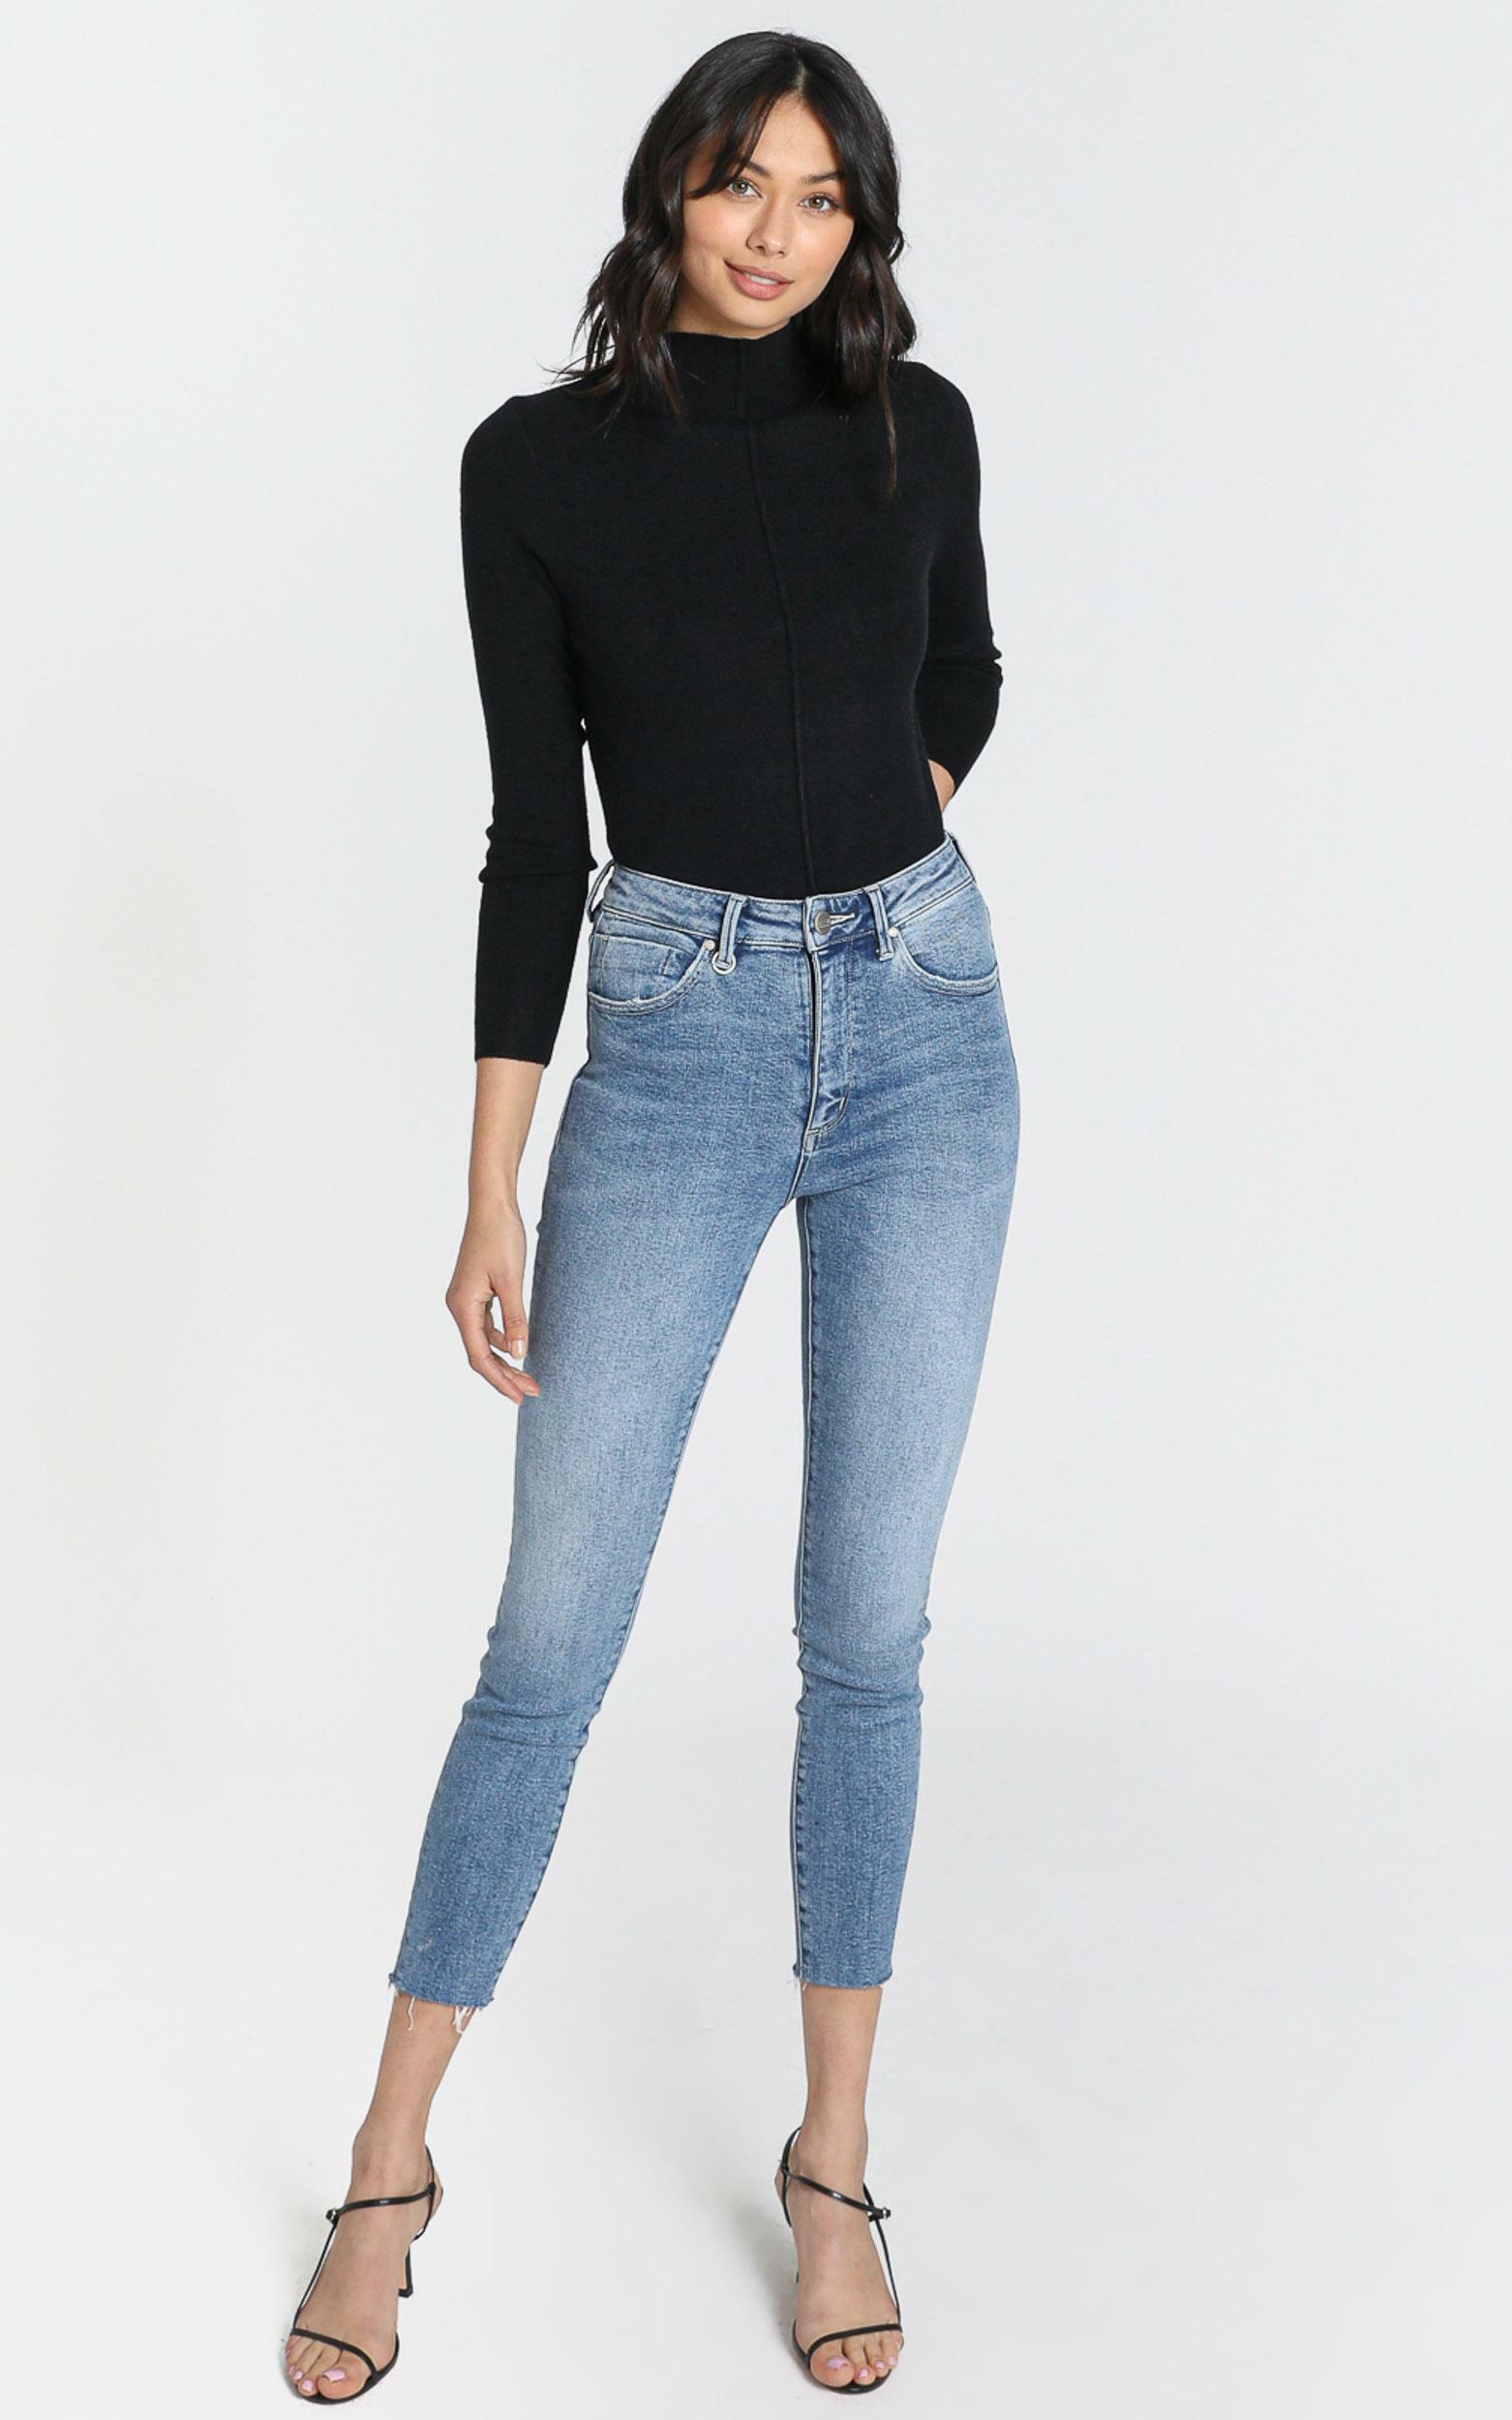 Neuw - Marilyn Skinny Jeans in Broken Blue - 24, Blue, hi-res image number null